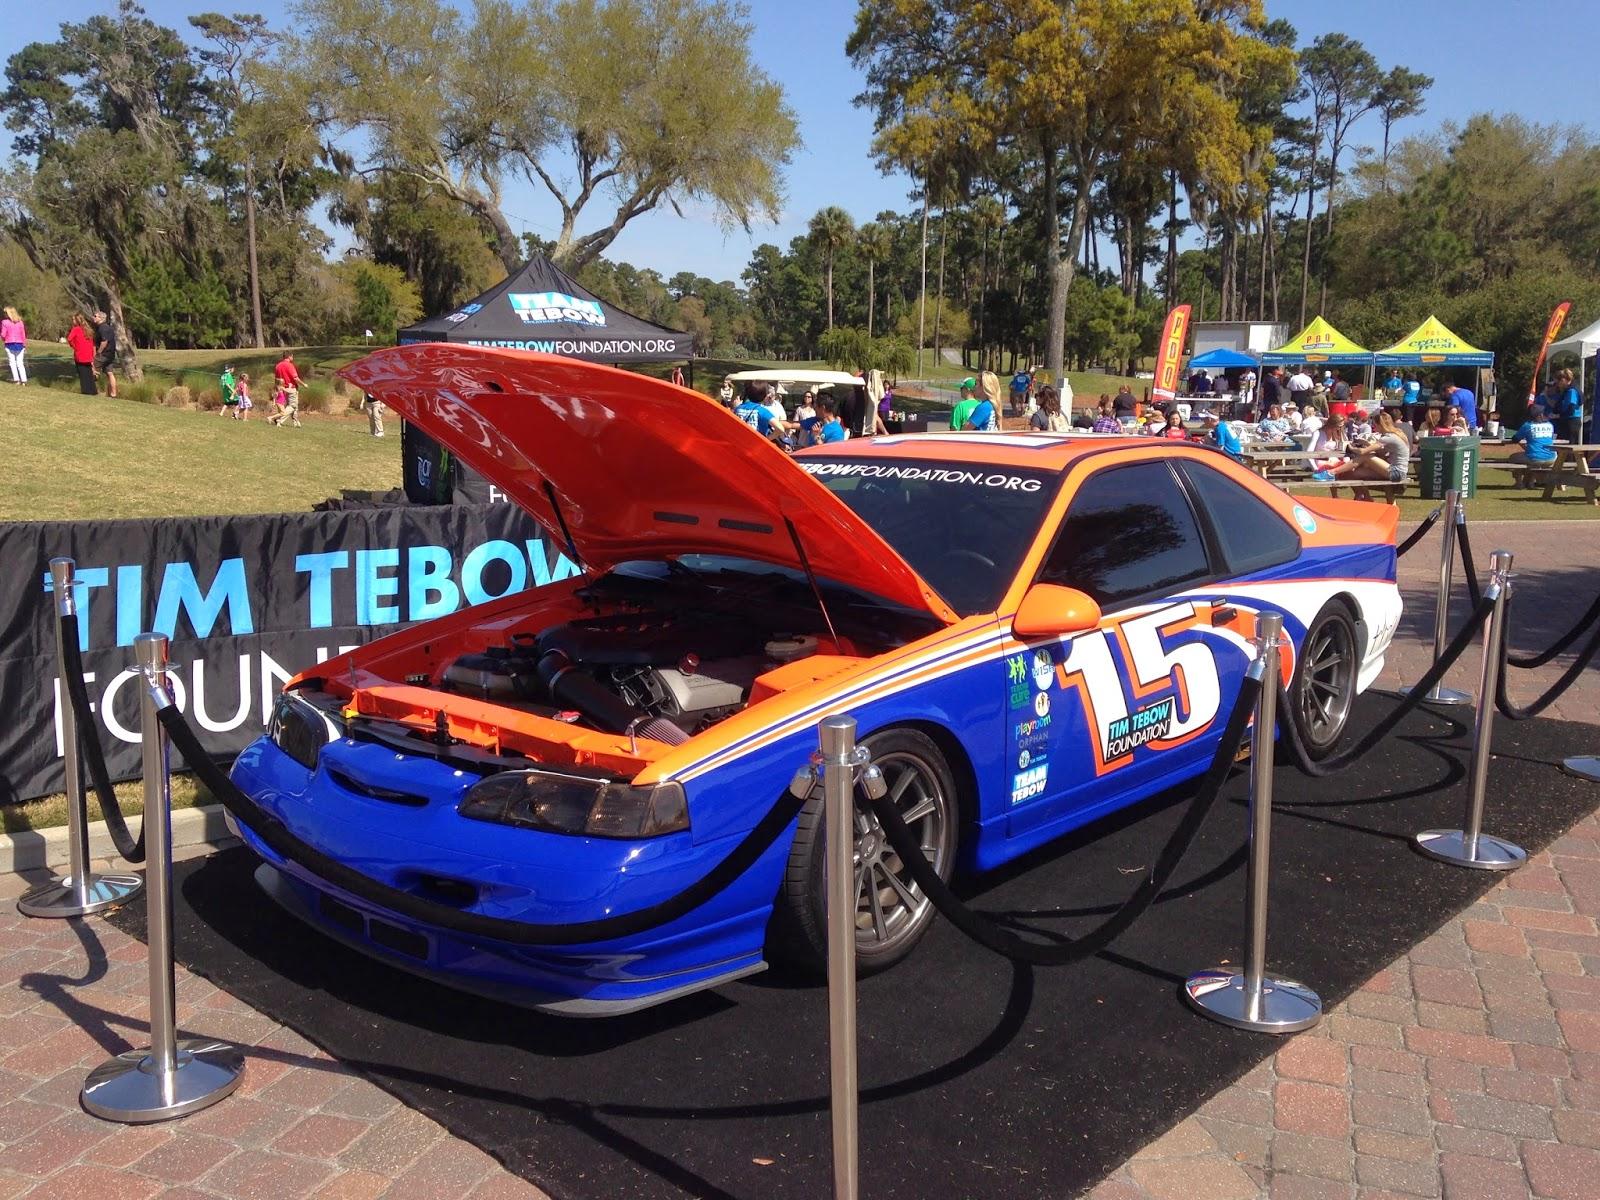 Thunderbird car - Color: Blue  // Description: fancy